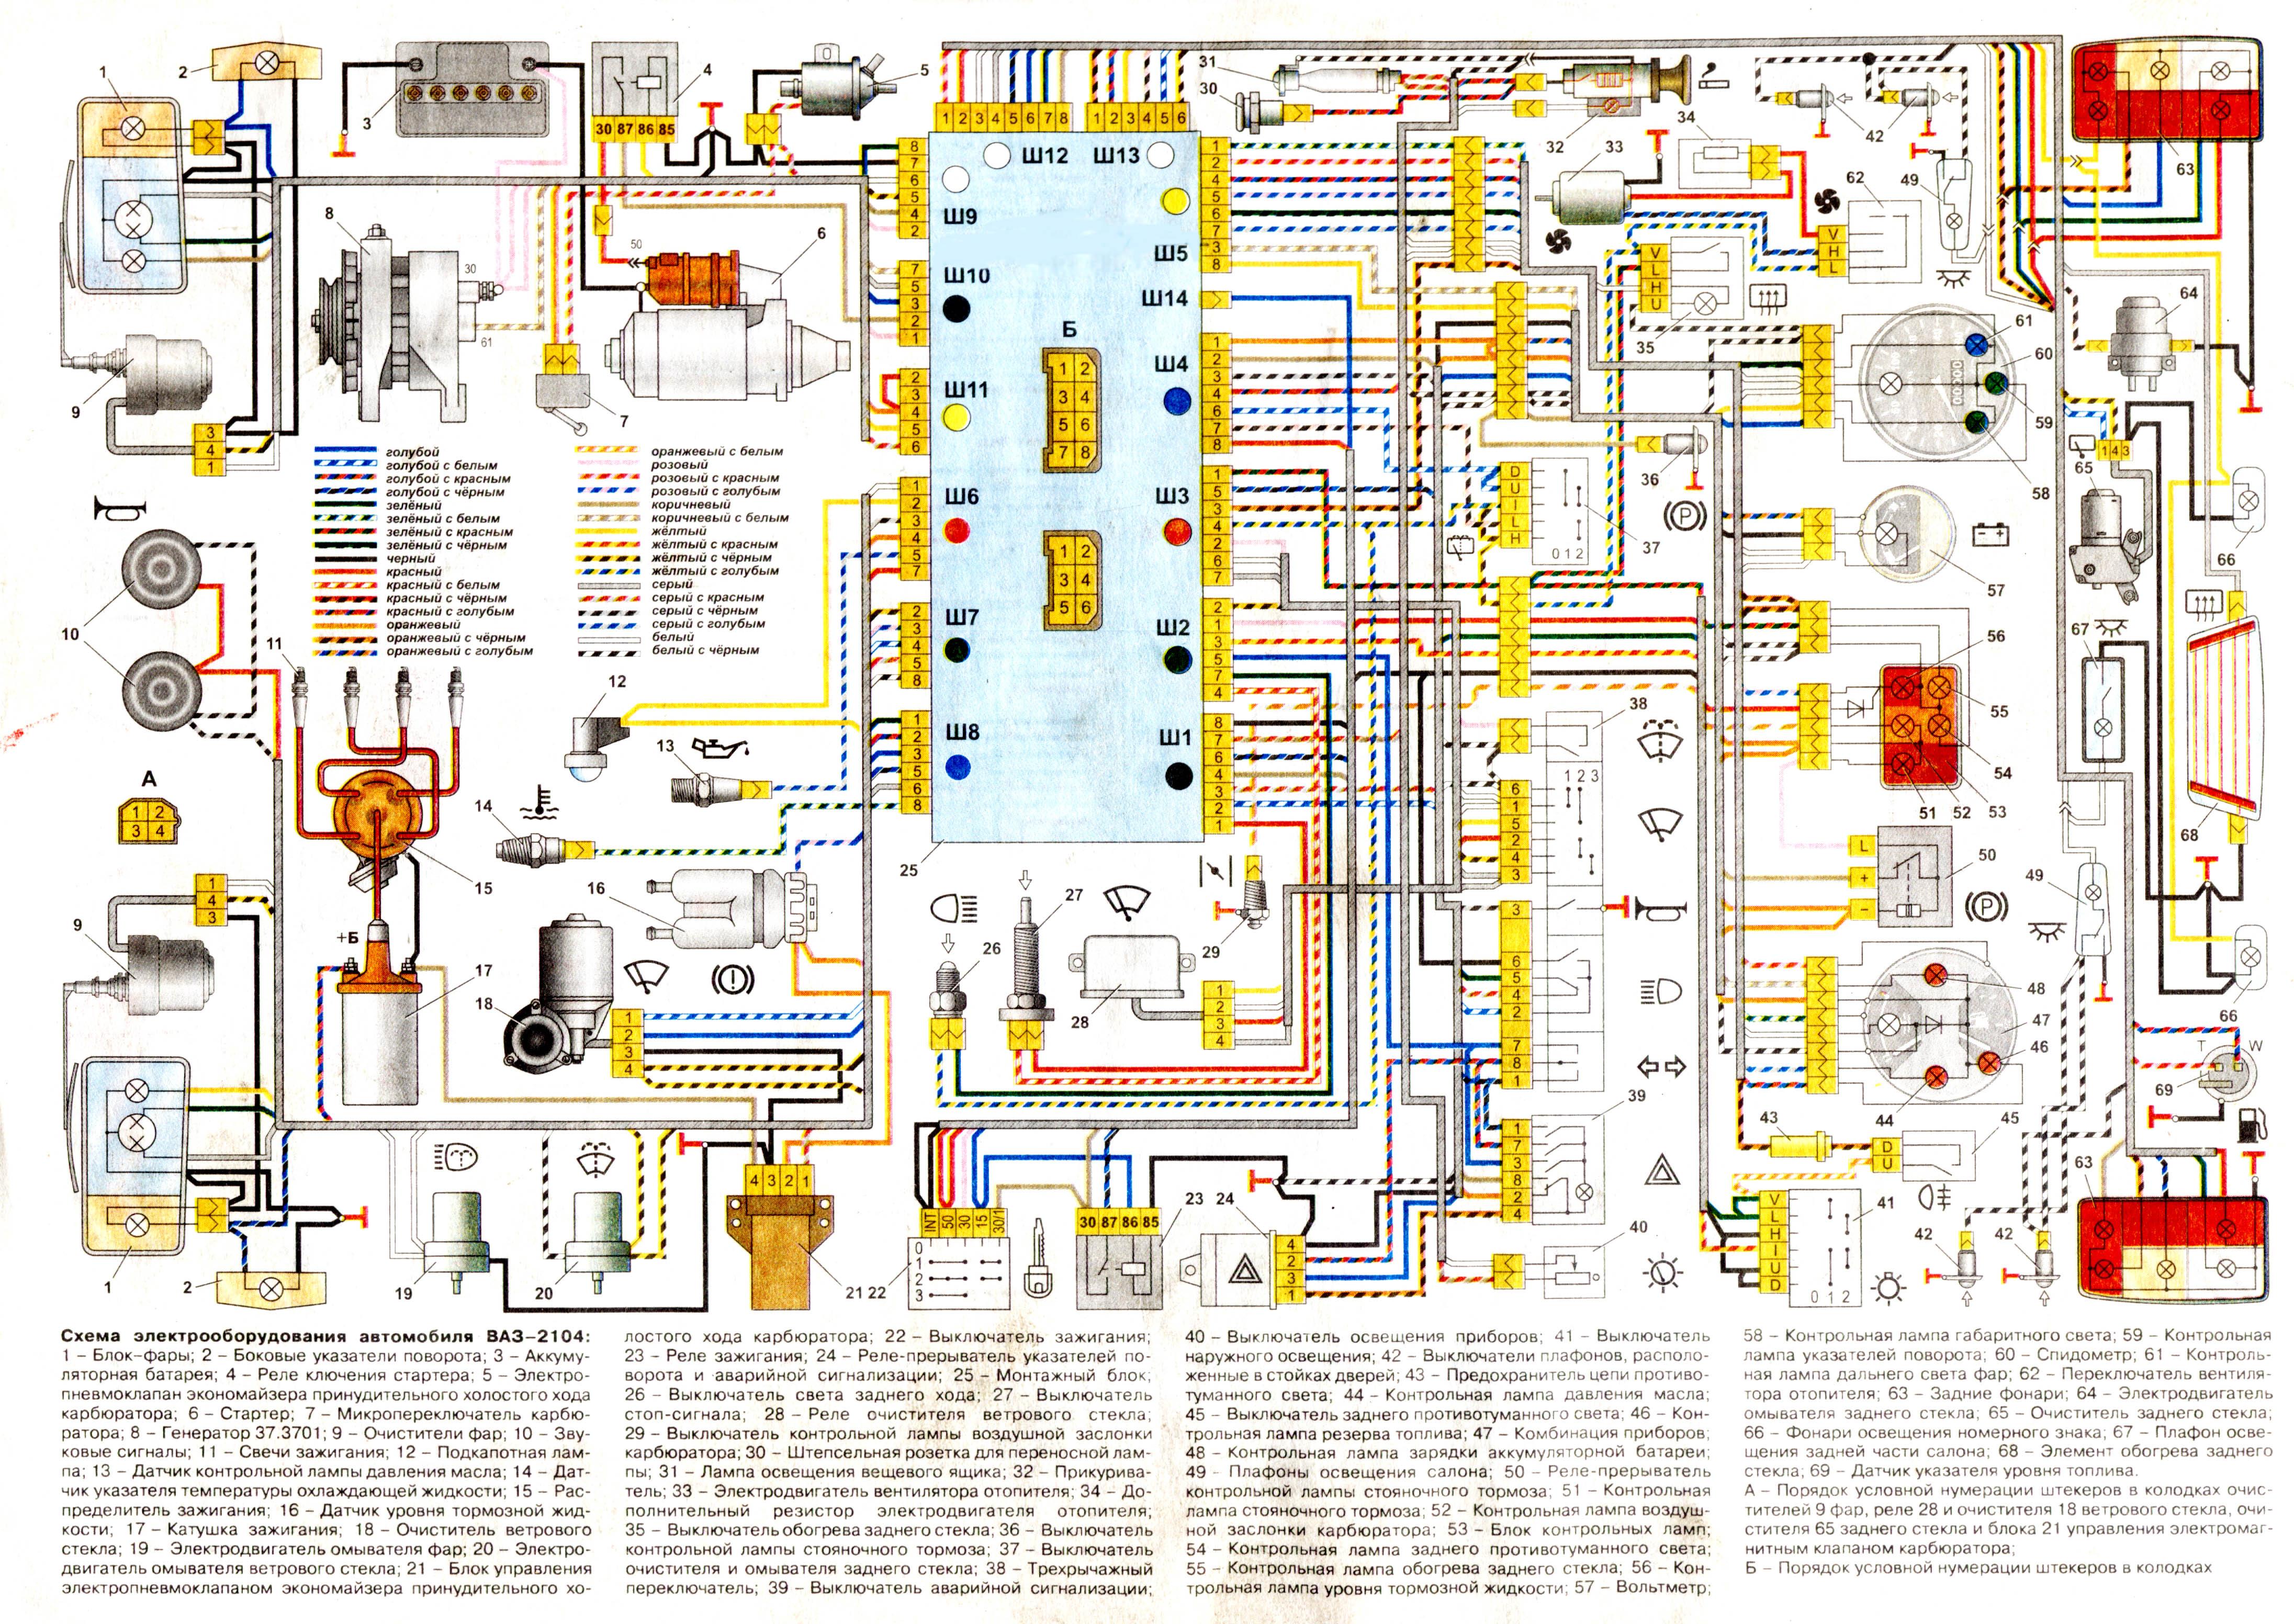 Электросхема автомобиль ВАЗ 2104